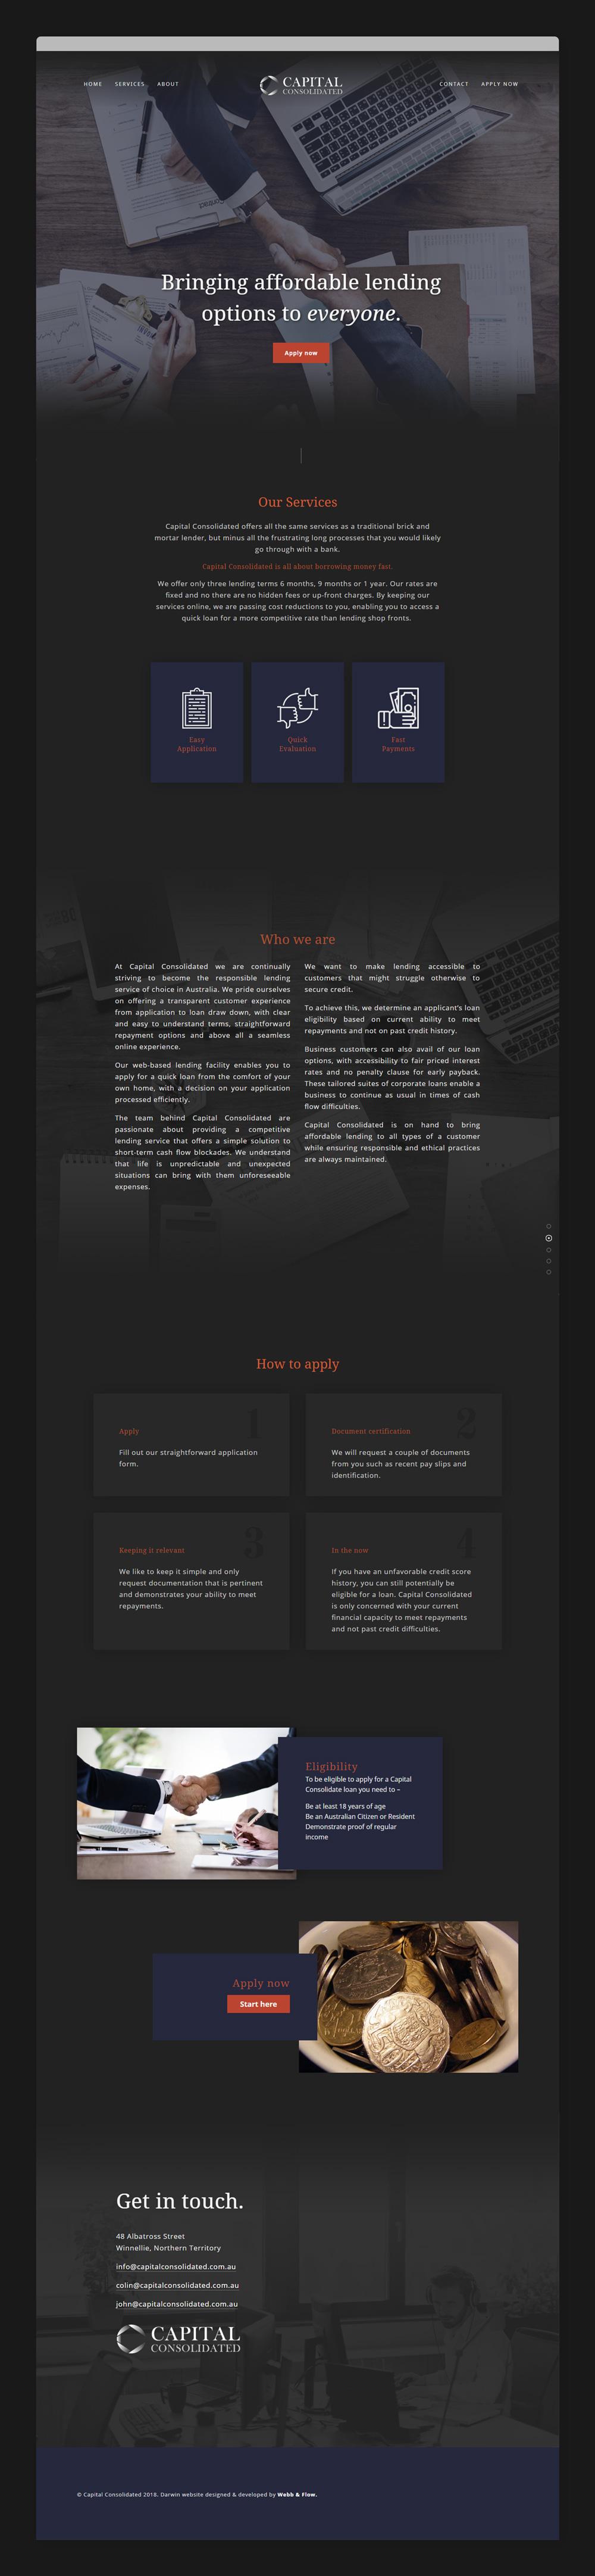 capital consolidated website finance affordable web designer